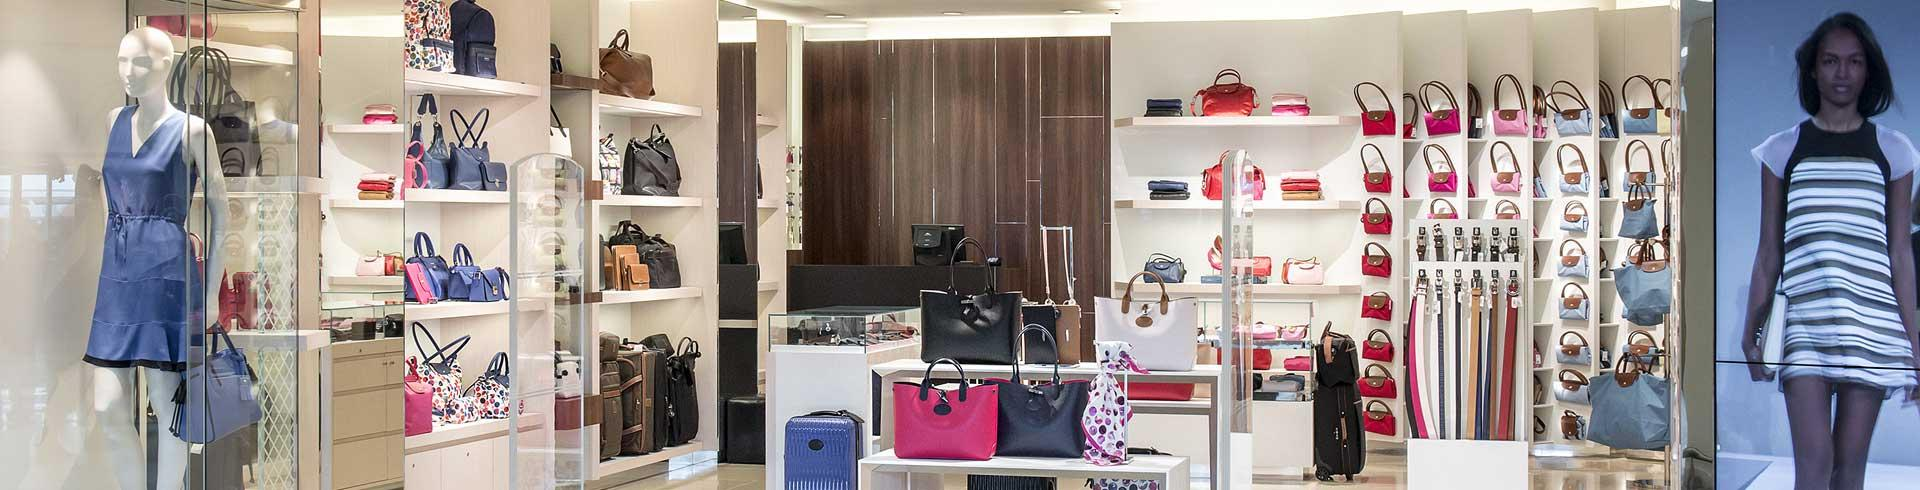 Shops   Services   La Promenade   Nice Airport Shopping   SHOPS ... 01796591402